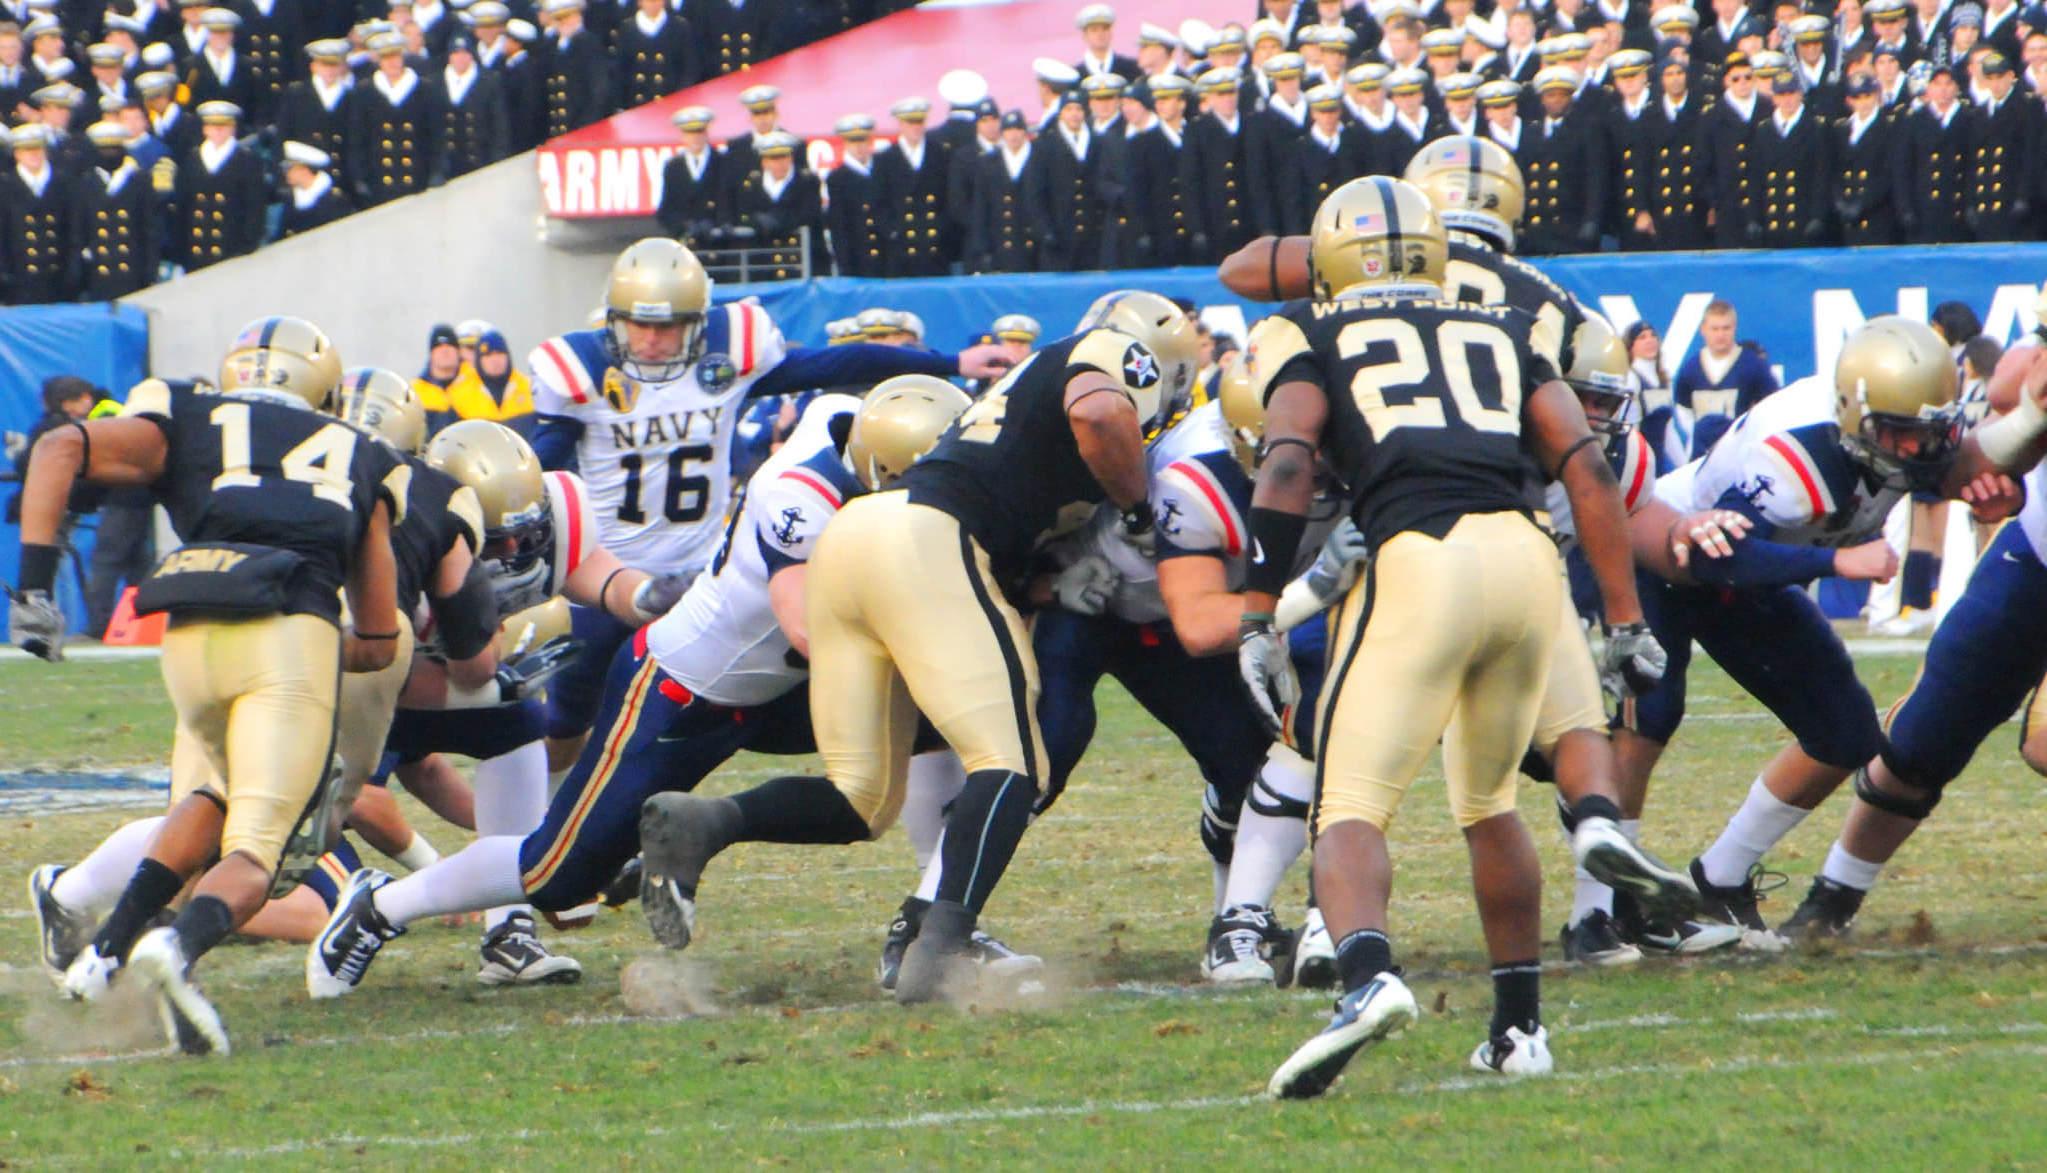 Army vs Navy NCAAF football rivalry